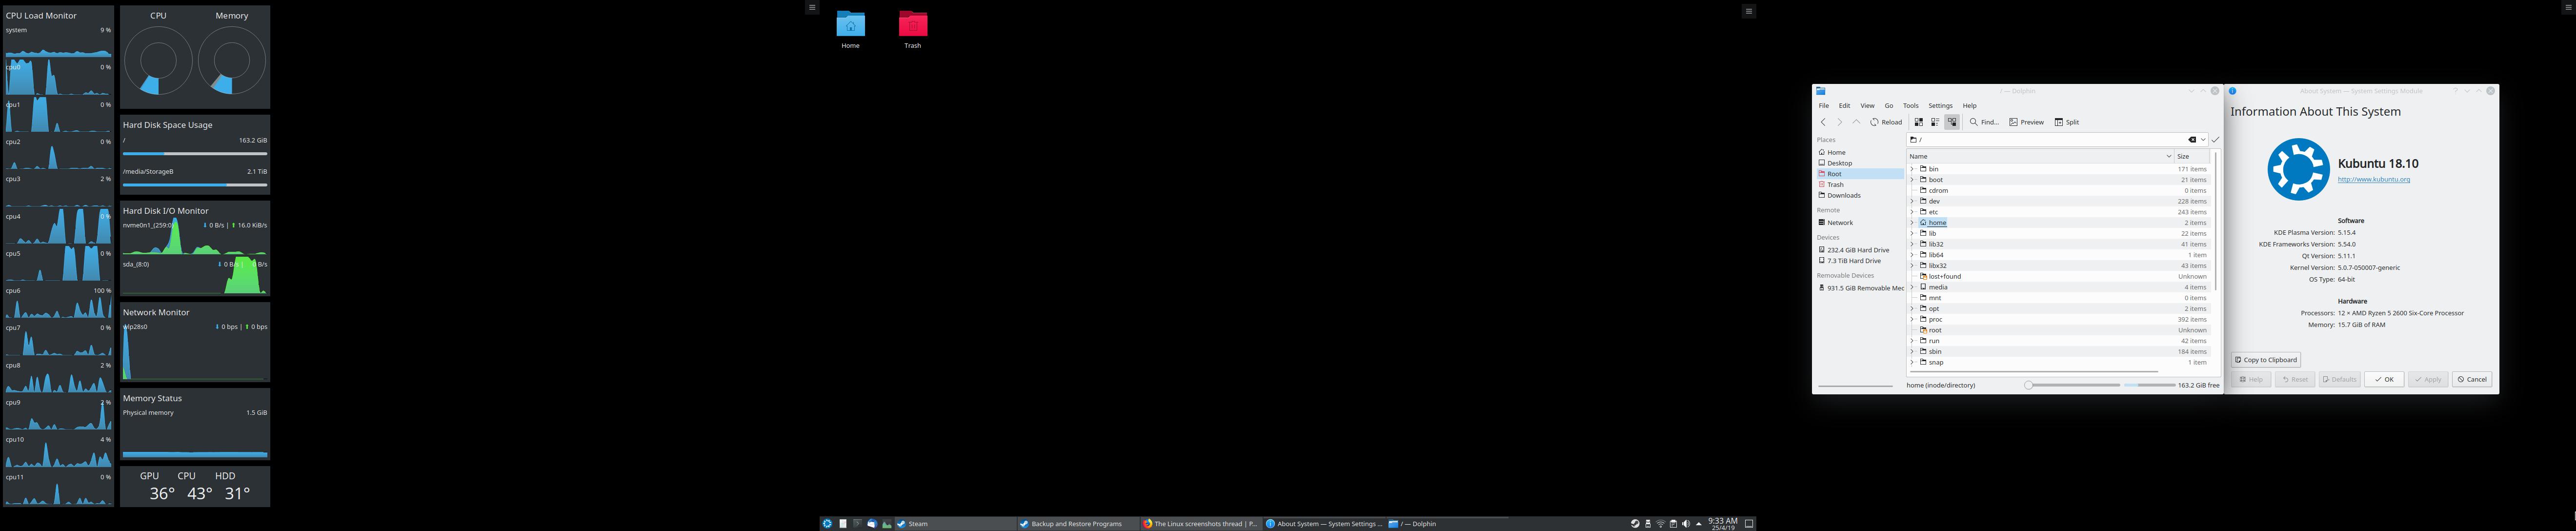 kubuntu1810Linux50.png